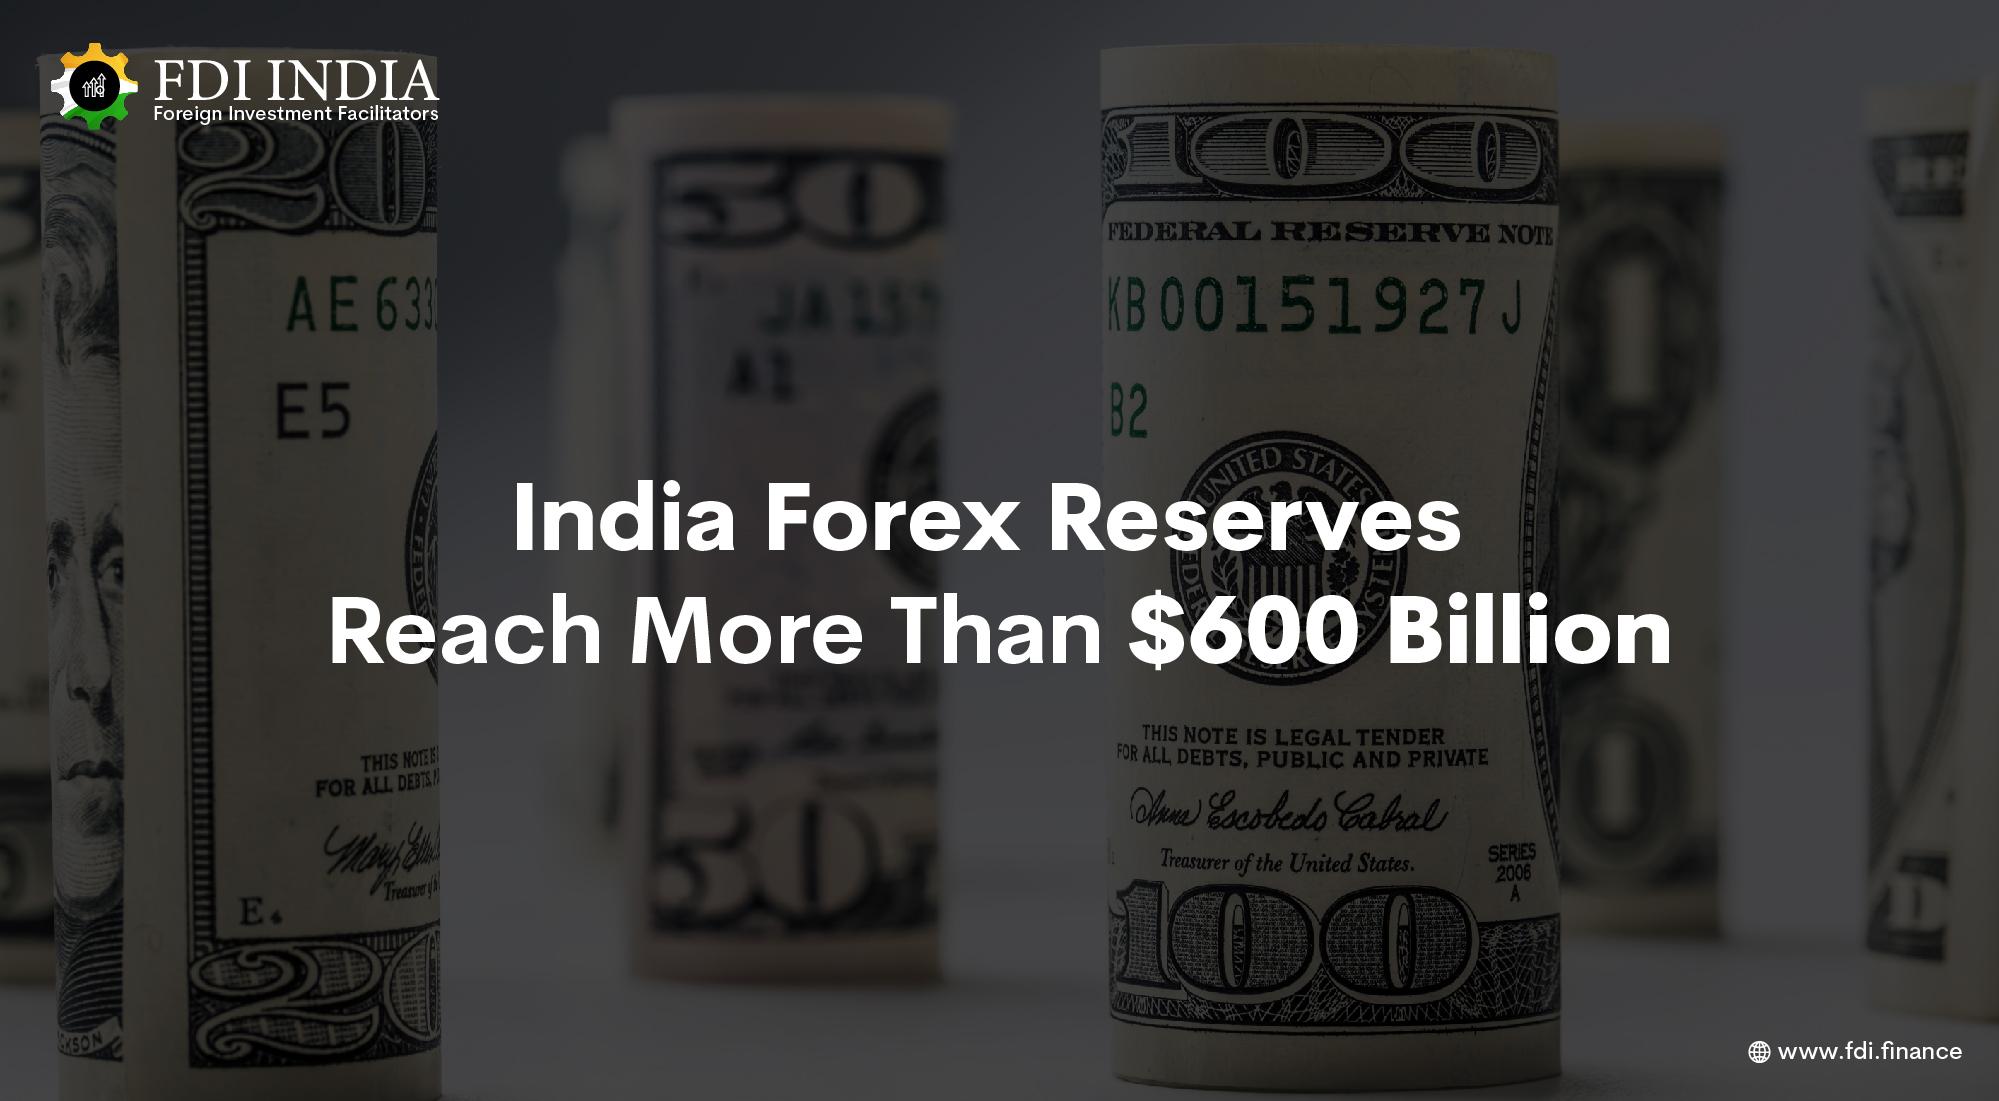 India Forex Reserves Reach More Than $600 Billion